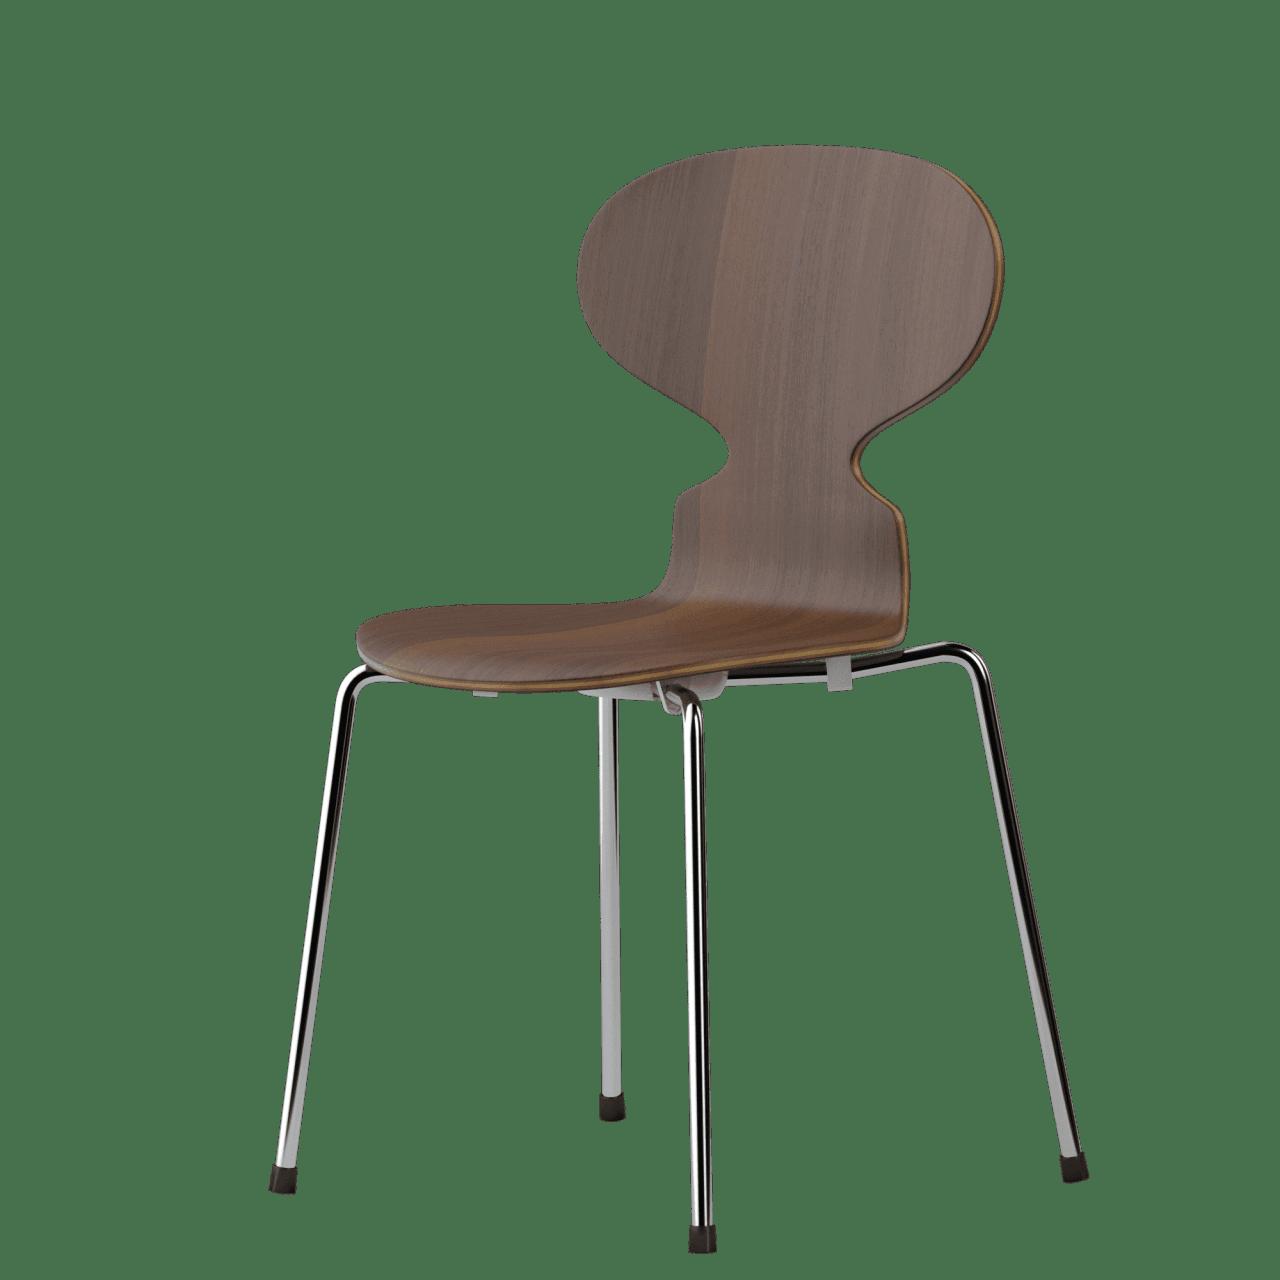 Die Ameise Stuhl natur